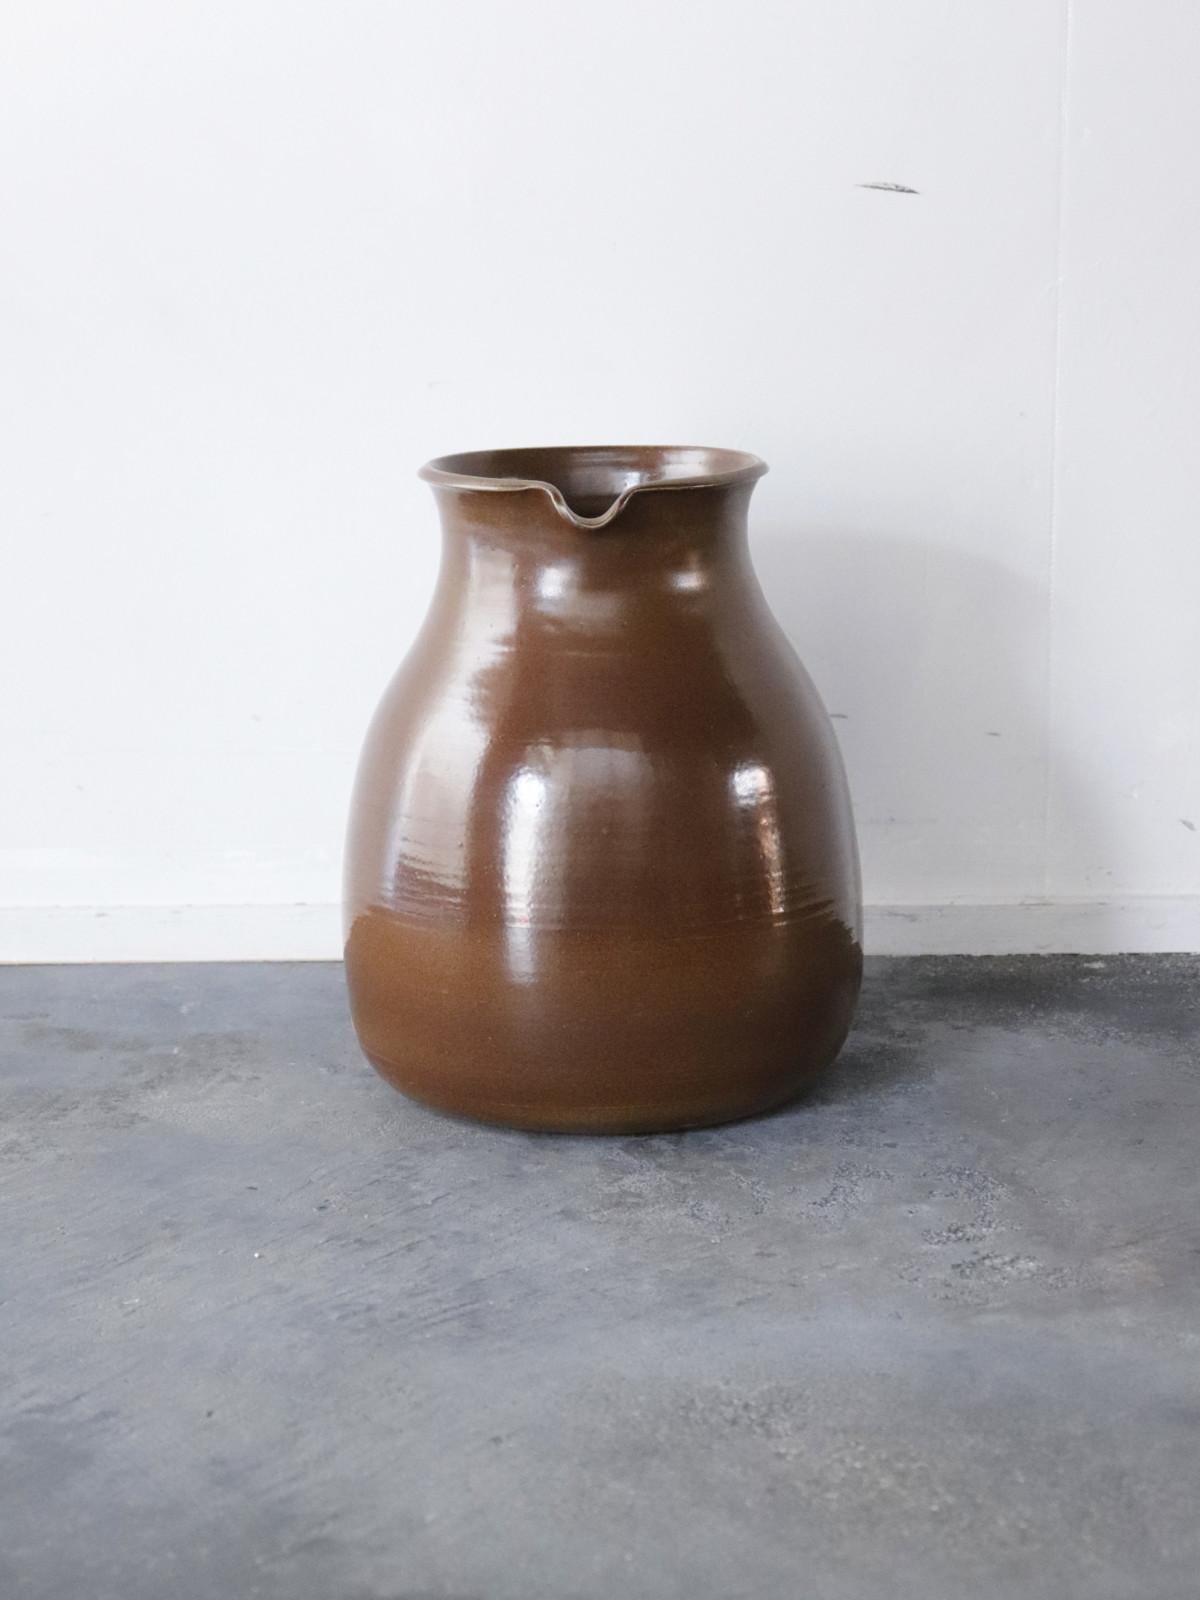 pitcher,Germany,Pottery,Dead stock